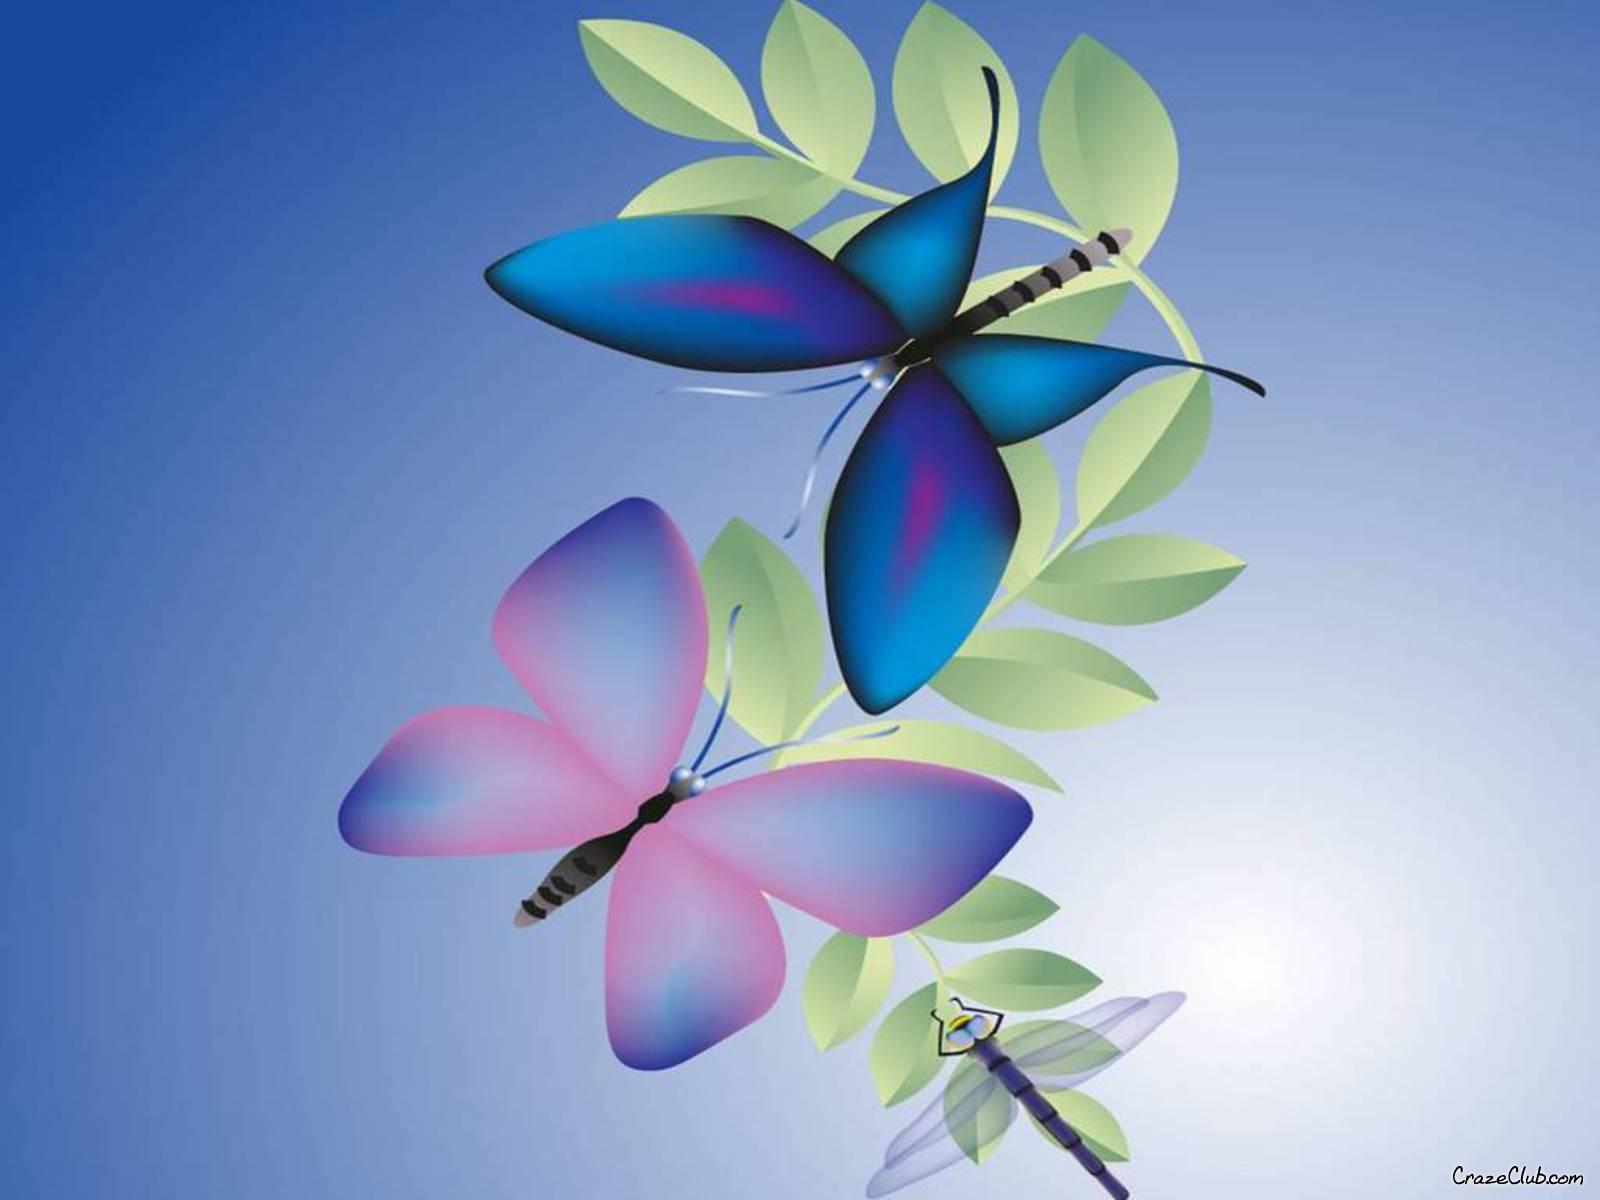 Enjoy: Butterfly Beautiful Wallpapers 10 Most Beautiful Butterflies